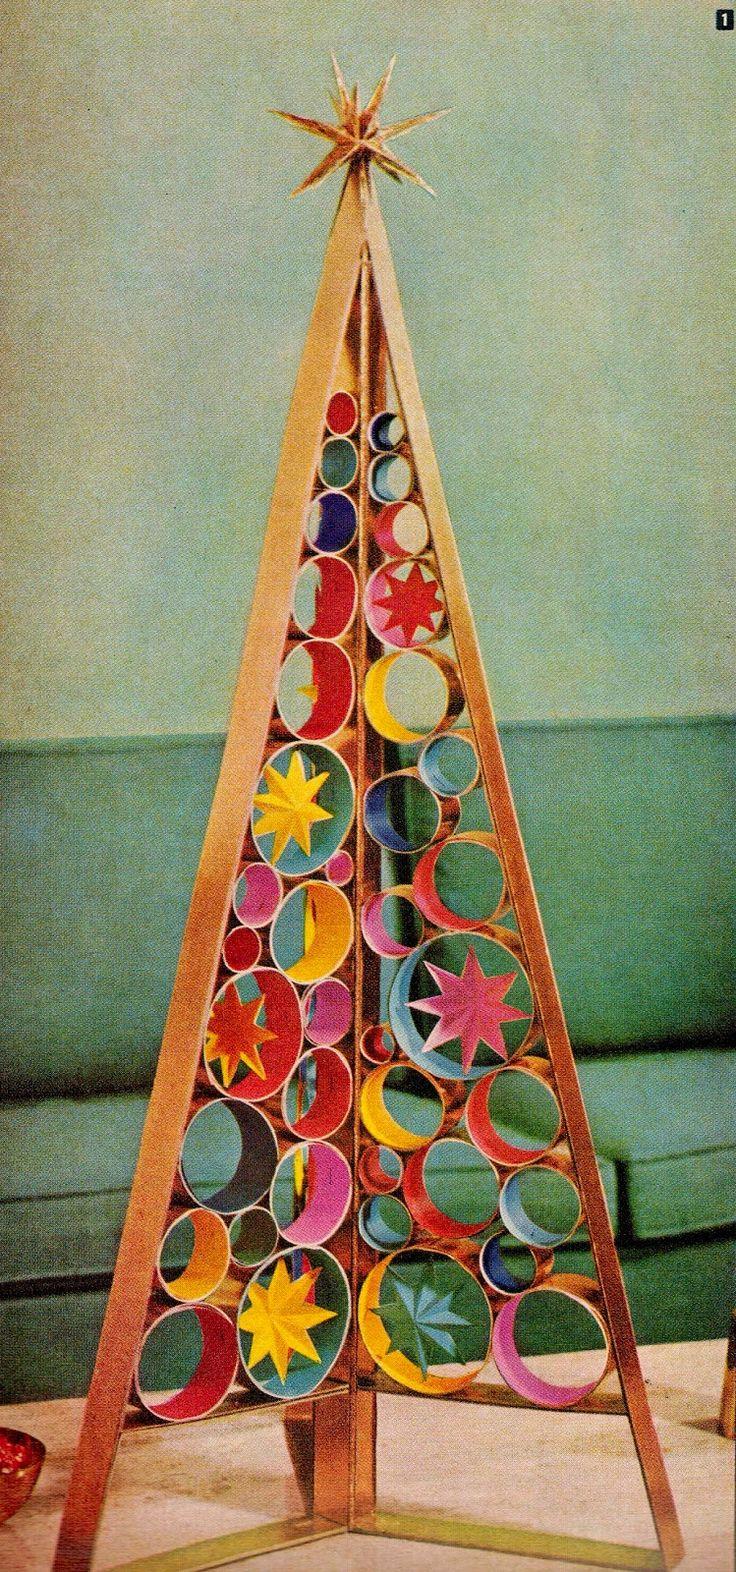 Best 25 Retro Christmas Ideas On Pinterest Retro